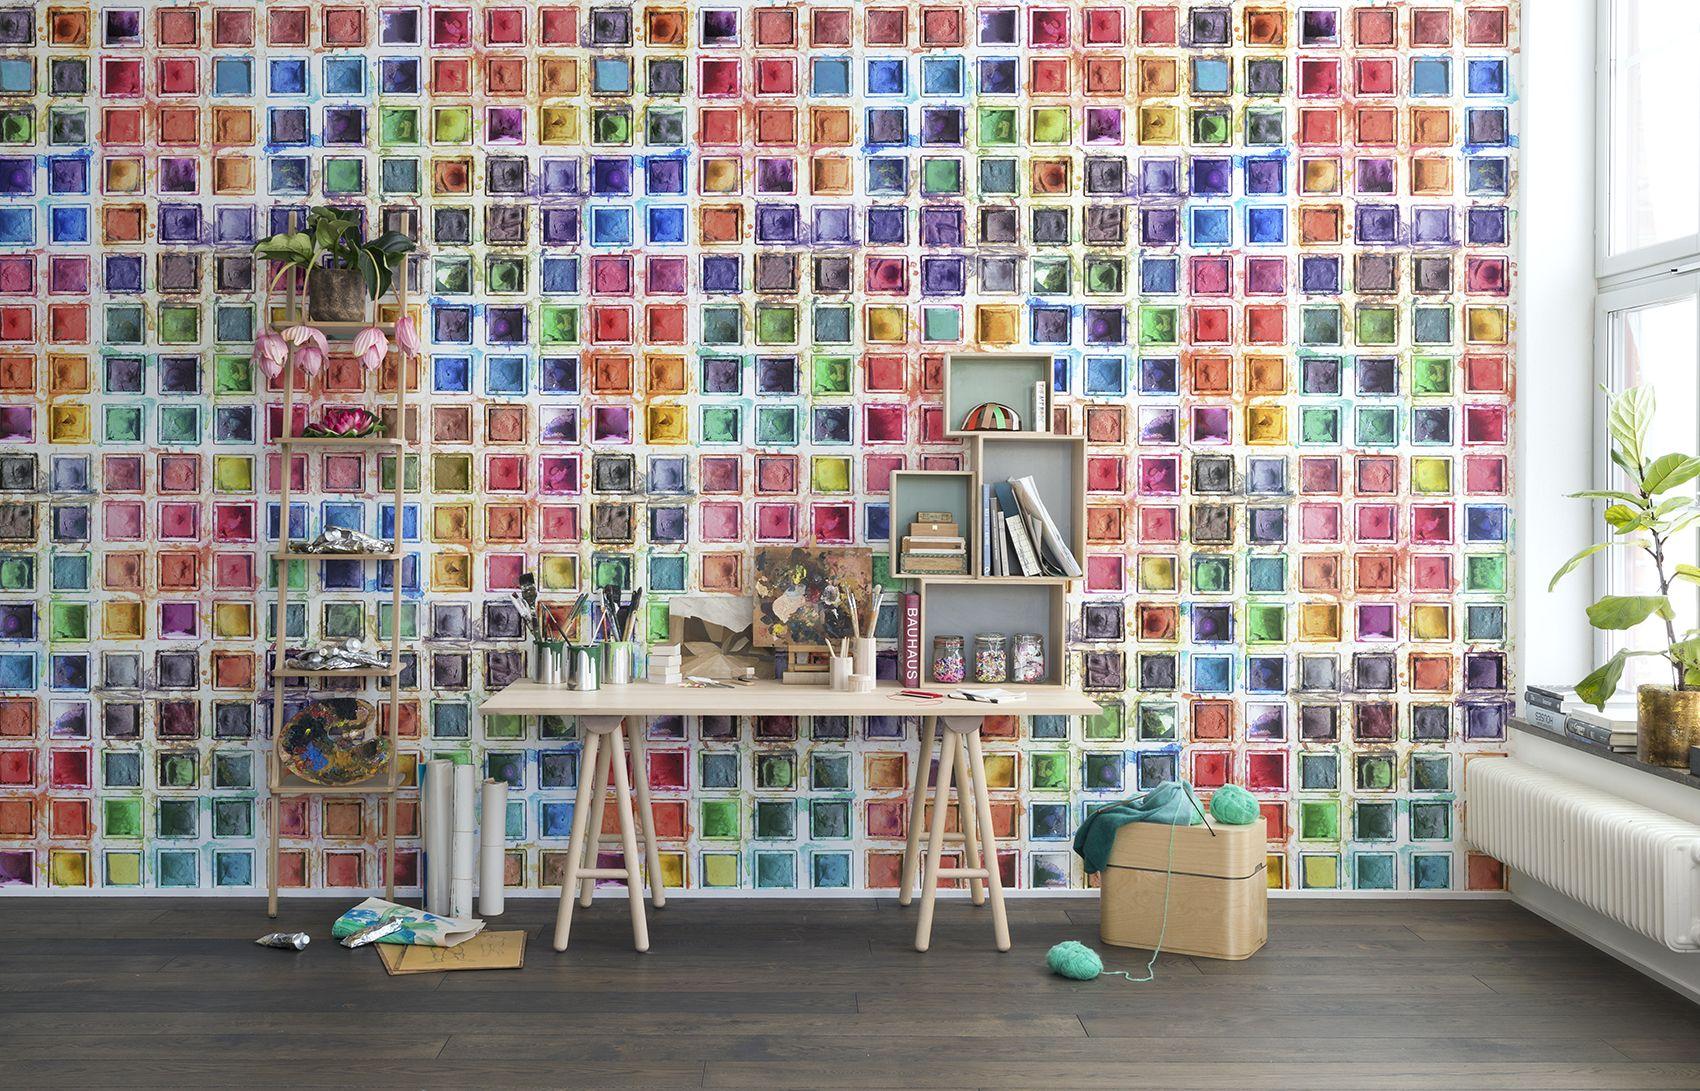 Tapete | Fototapete | Moderne Tapete | Mural Tapete | Wandgestaltung |  Wandverkleidung | Tapete Kinderzimmer